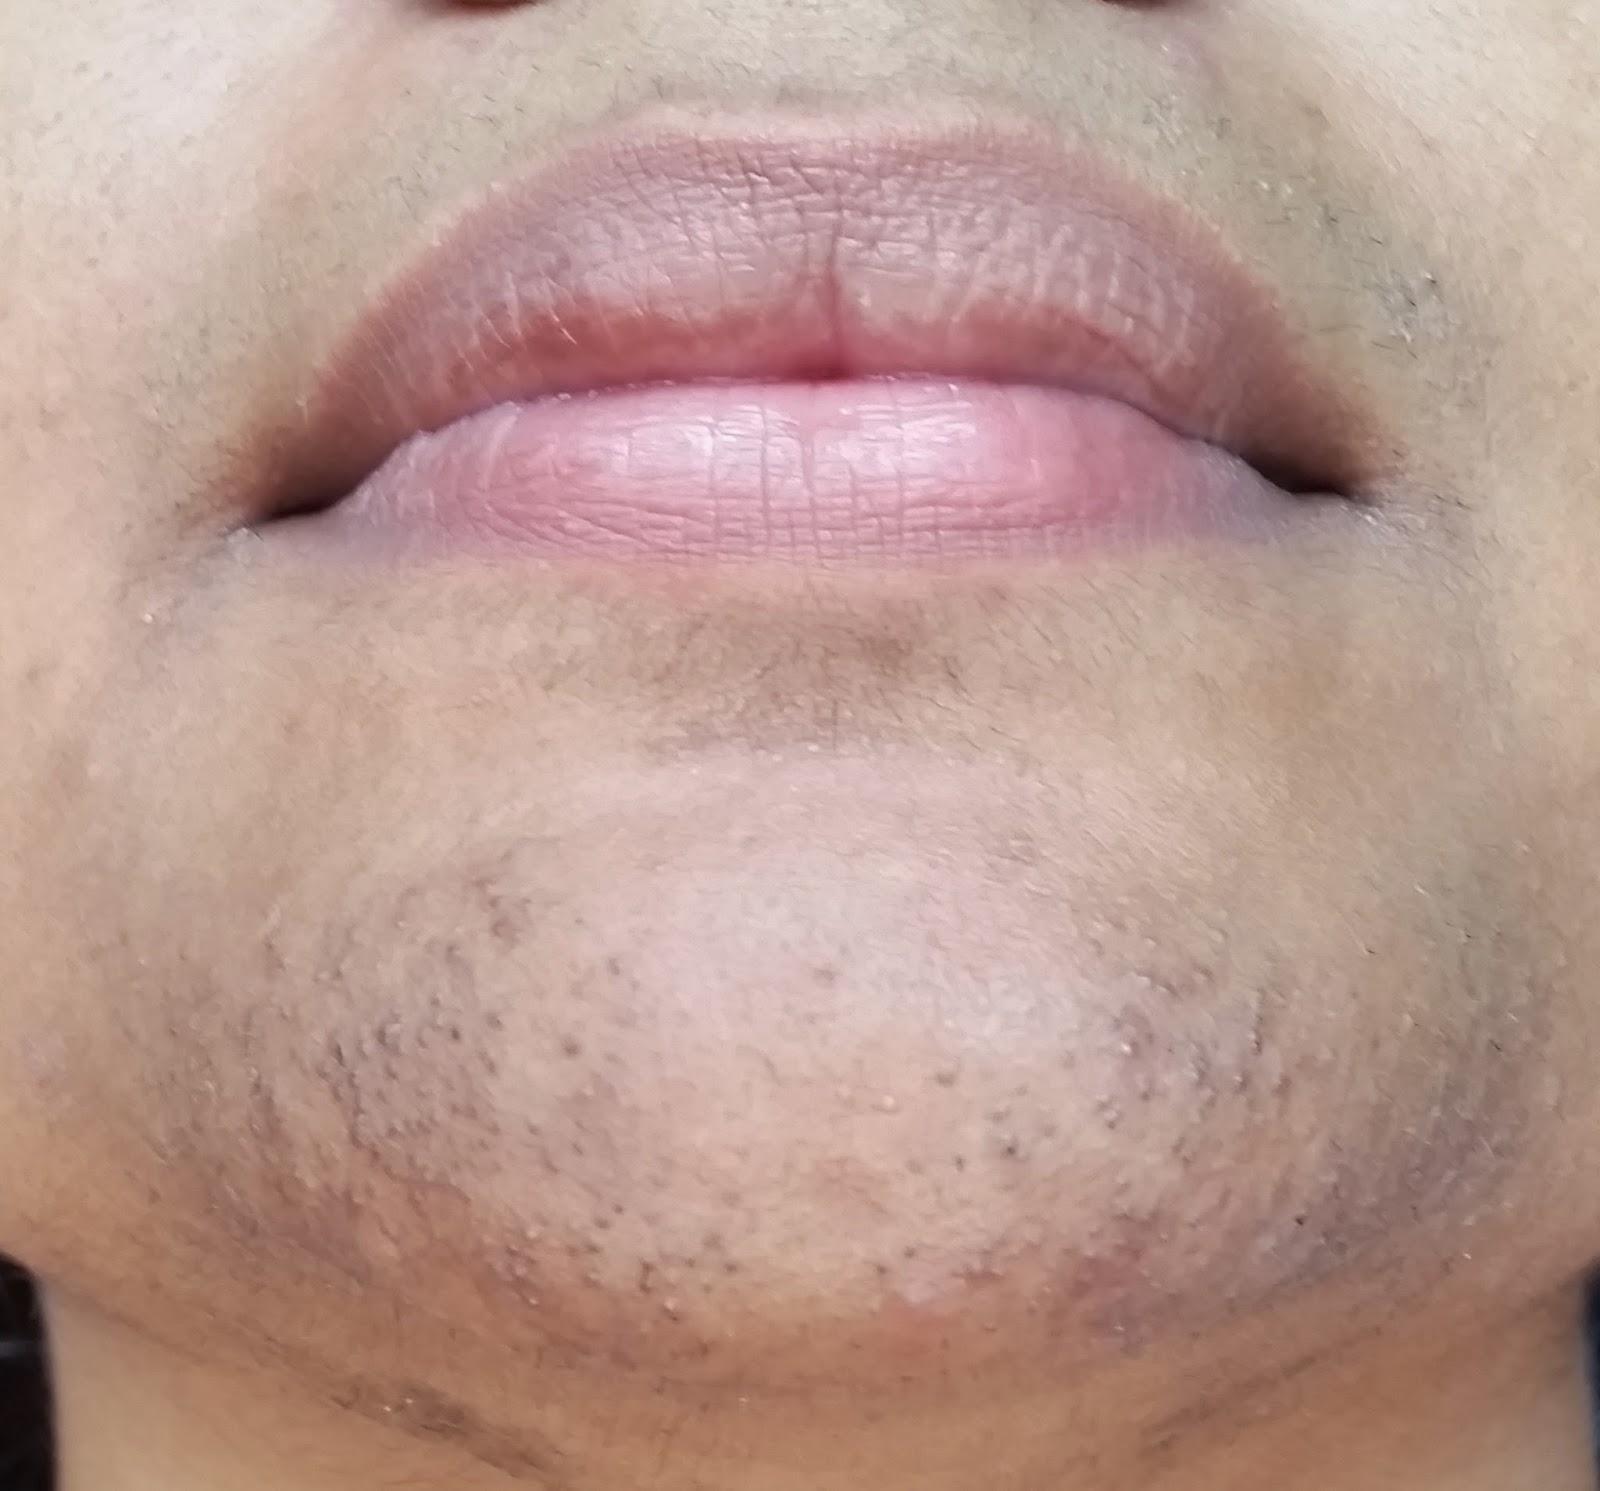 Pcos facial hair treatment